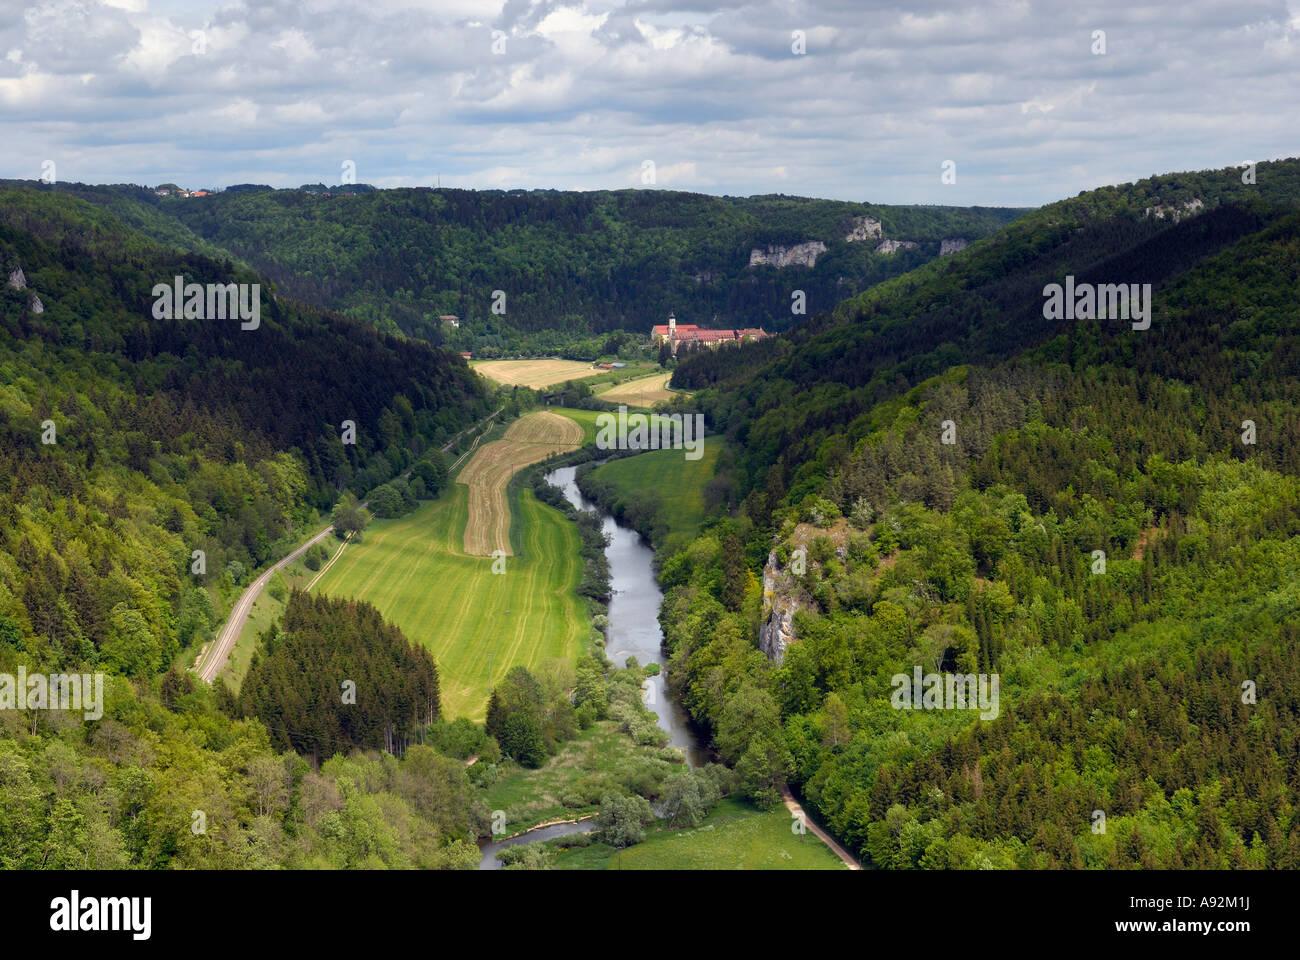 Danube valley - Overview, Swabian Alb, Baden-Wuerttemberg, Germany, Europe. Stock Photo